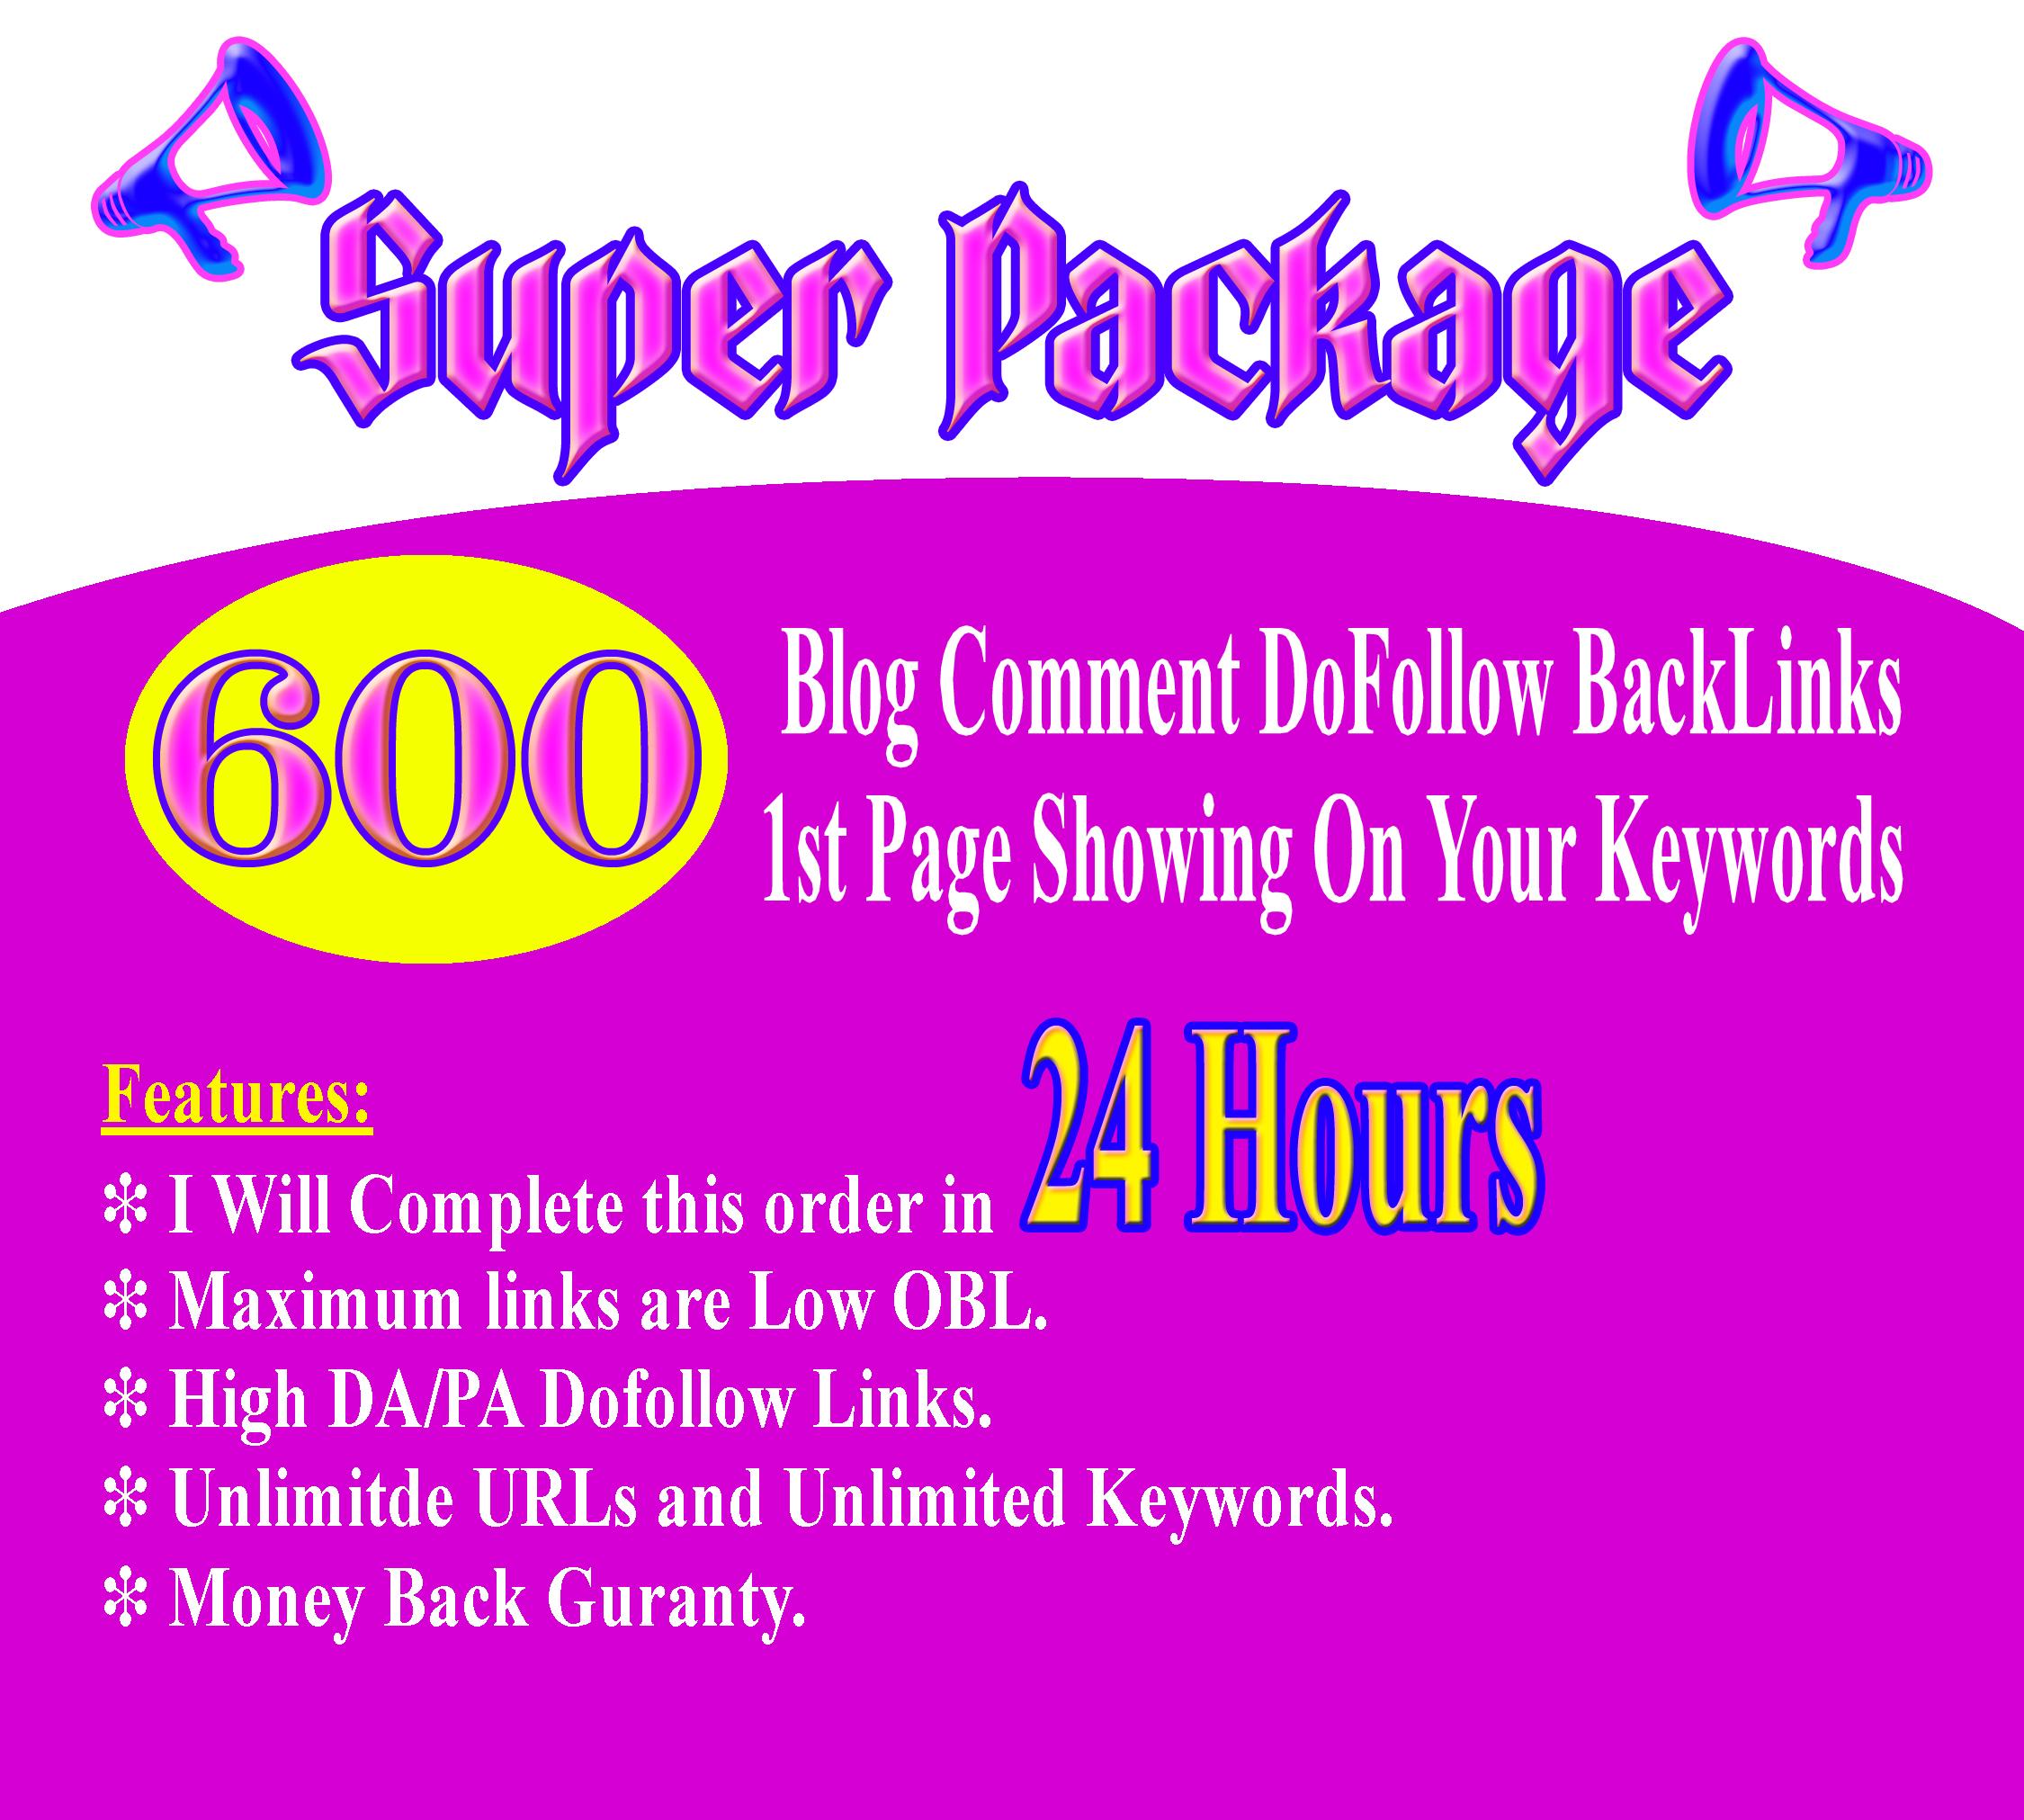 Super package for Limited time offer 600 Blog comment Dofollow backlinks